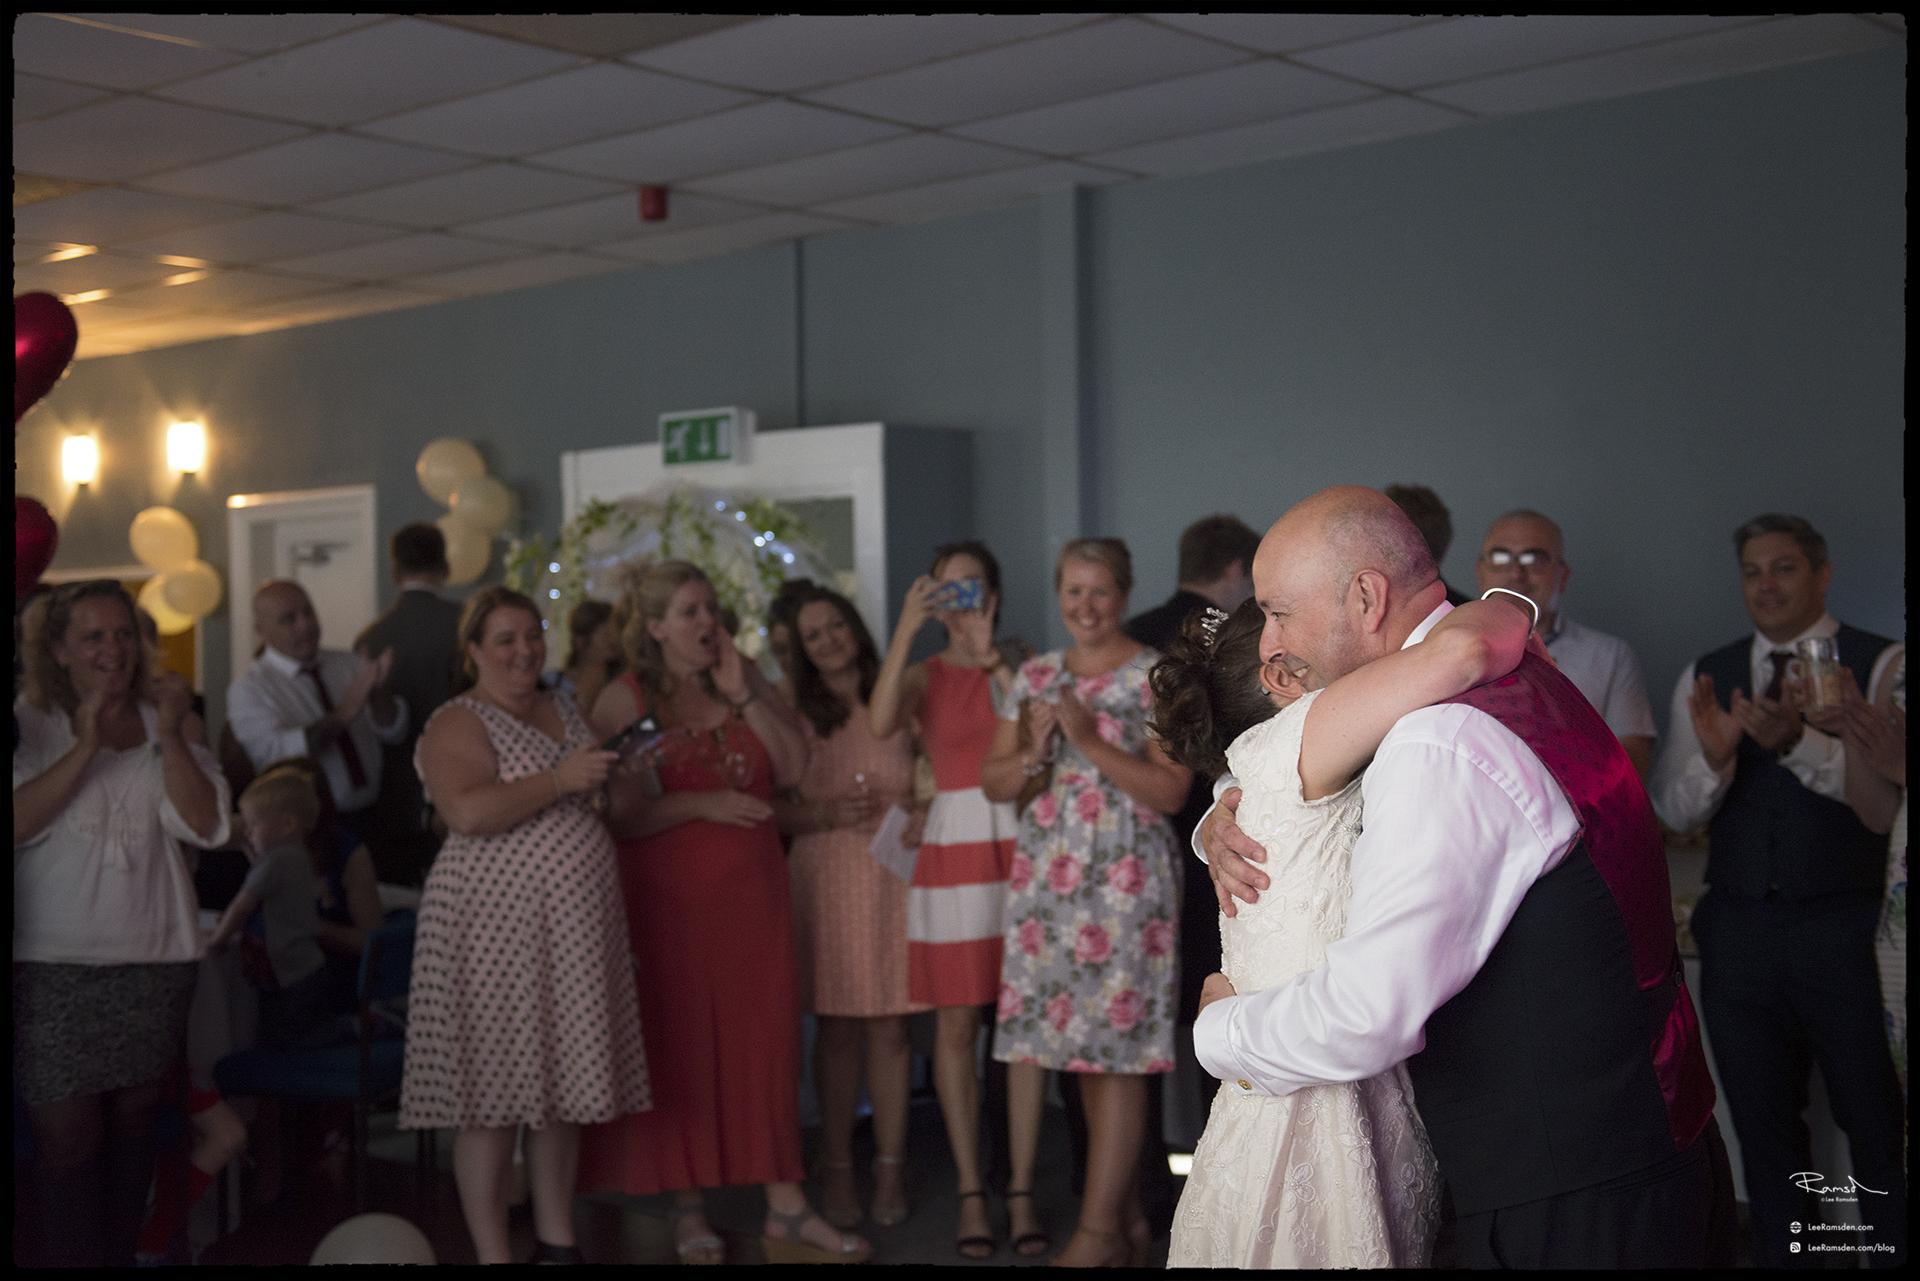 12 Lee Ramsden Wedding photography photographer Lancashire Lytham St Annes Ansdell Fylde reportage professional award winning www.leeramsden.com